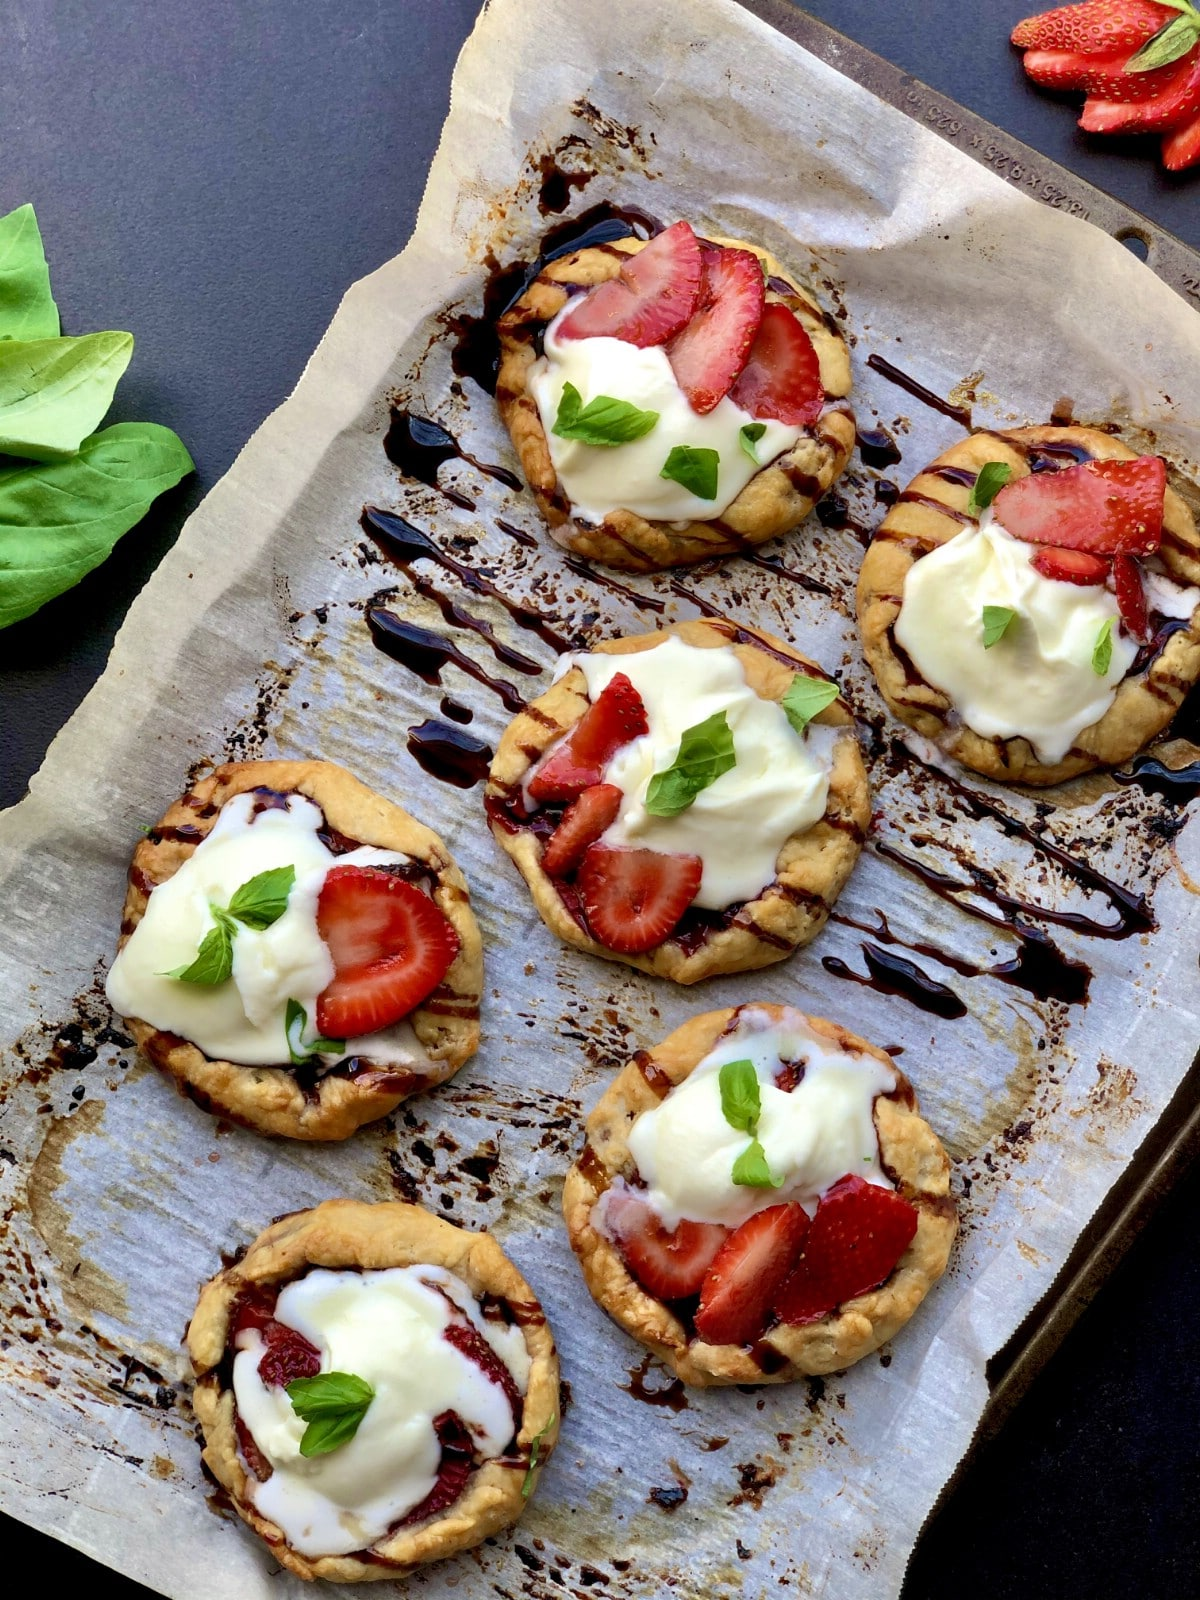 Strawberry balsamic galettes on serving platter